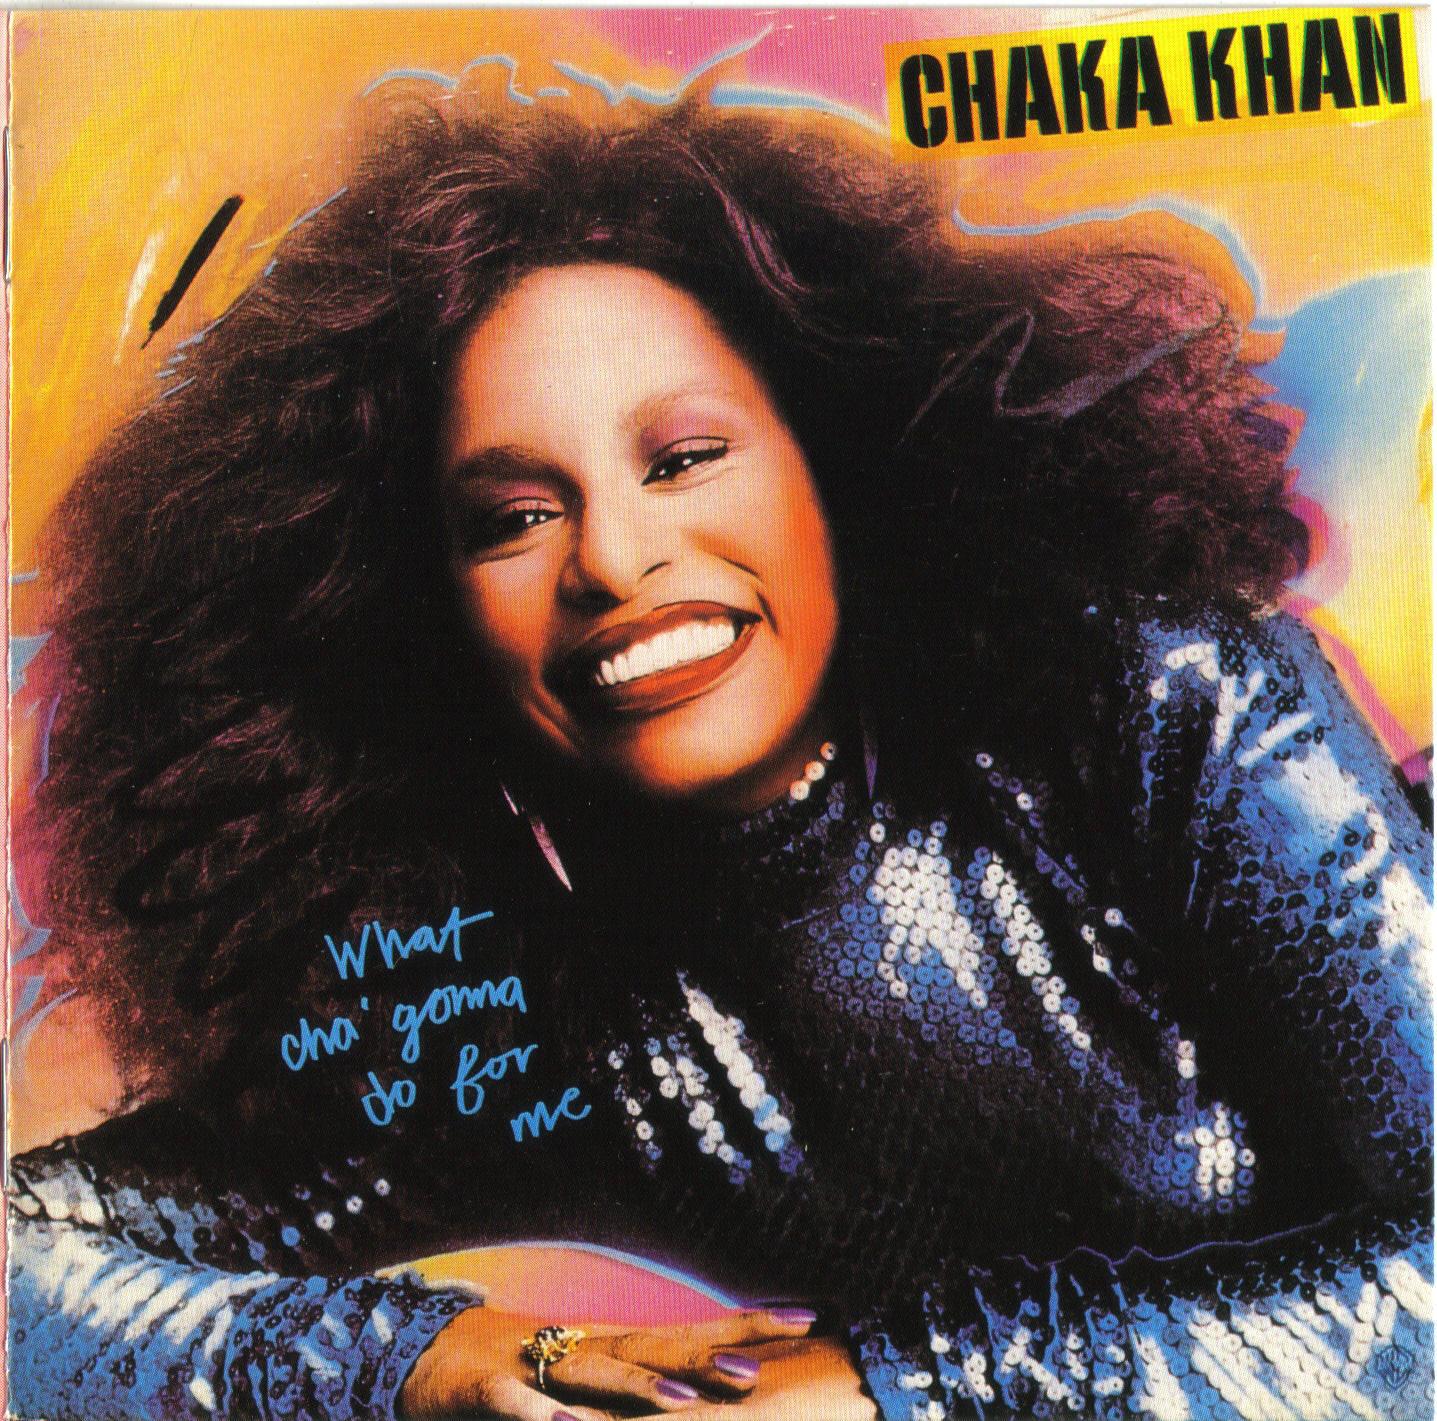 What Cha' Gonna Do For Me - Chaka Khan